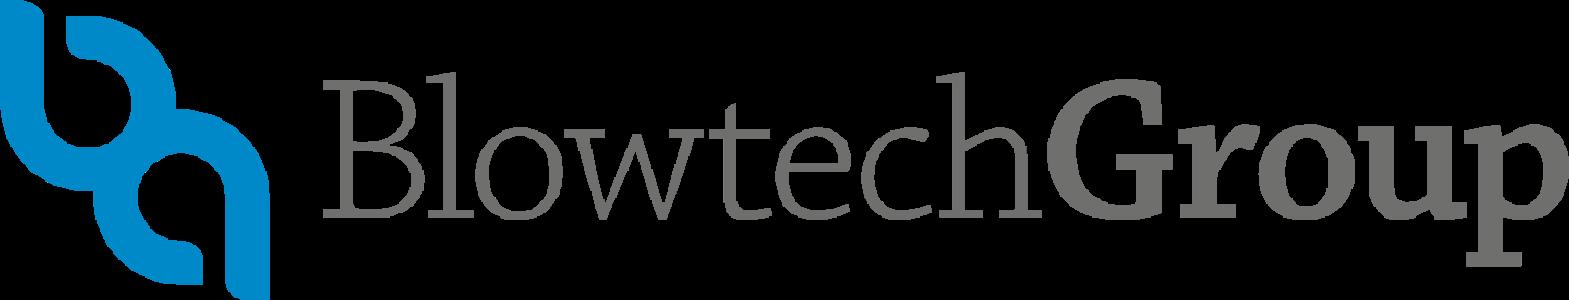 Blowtech Group